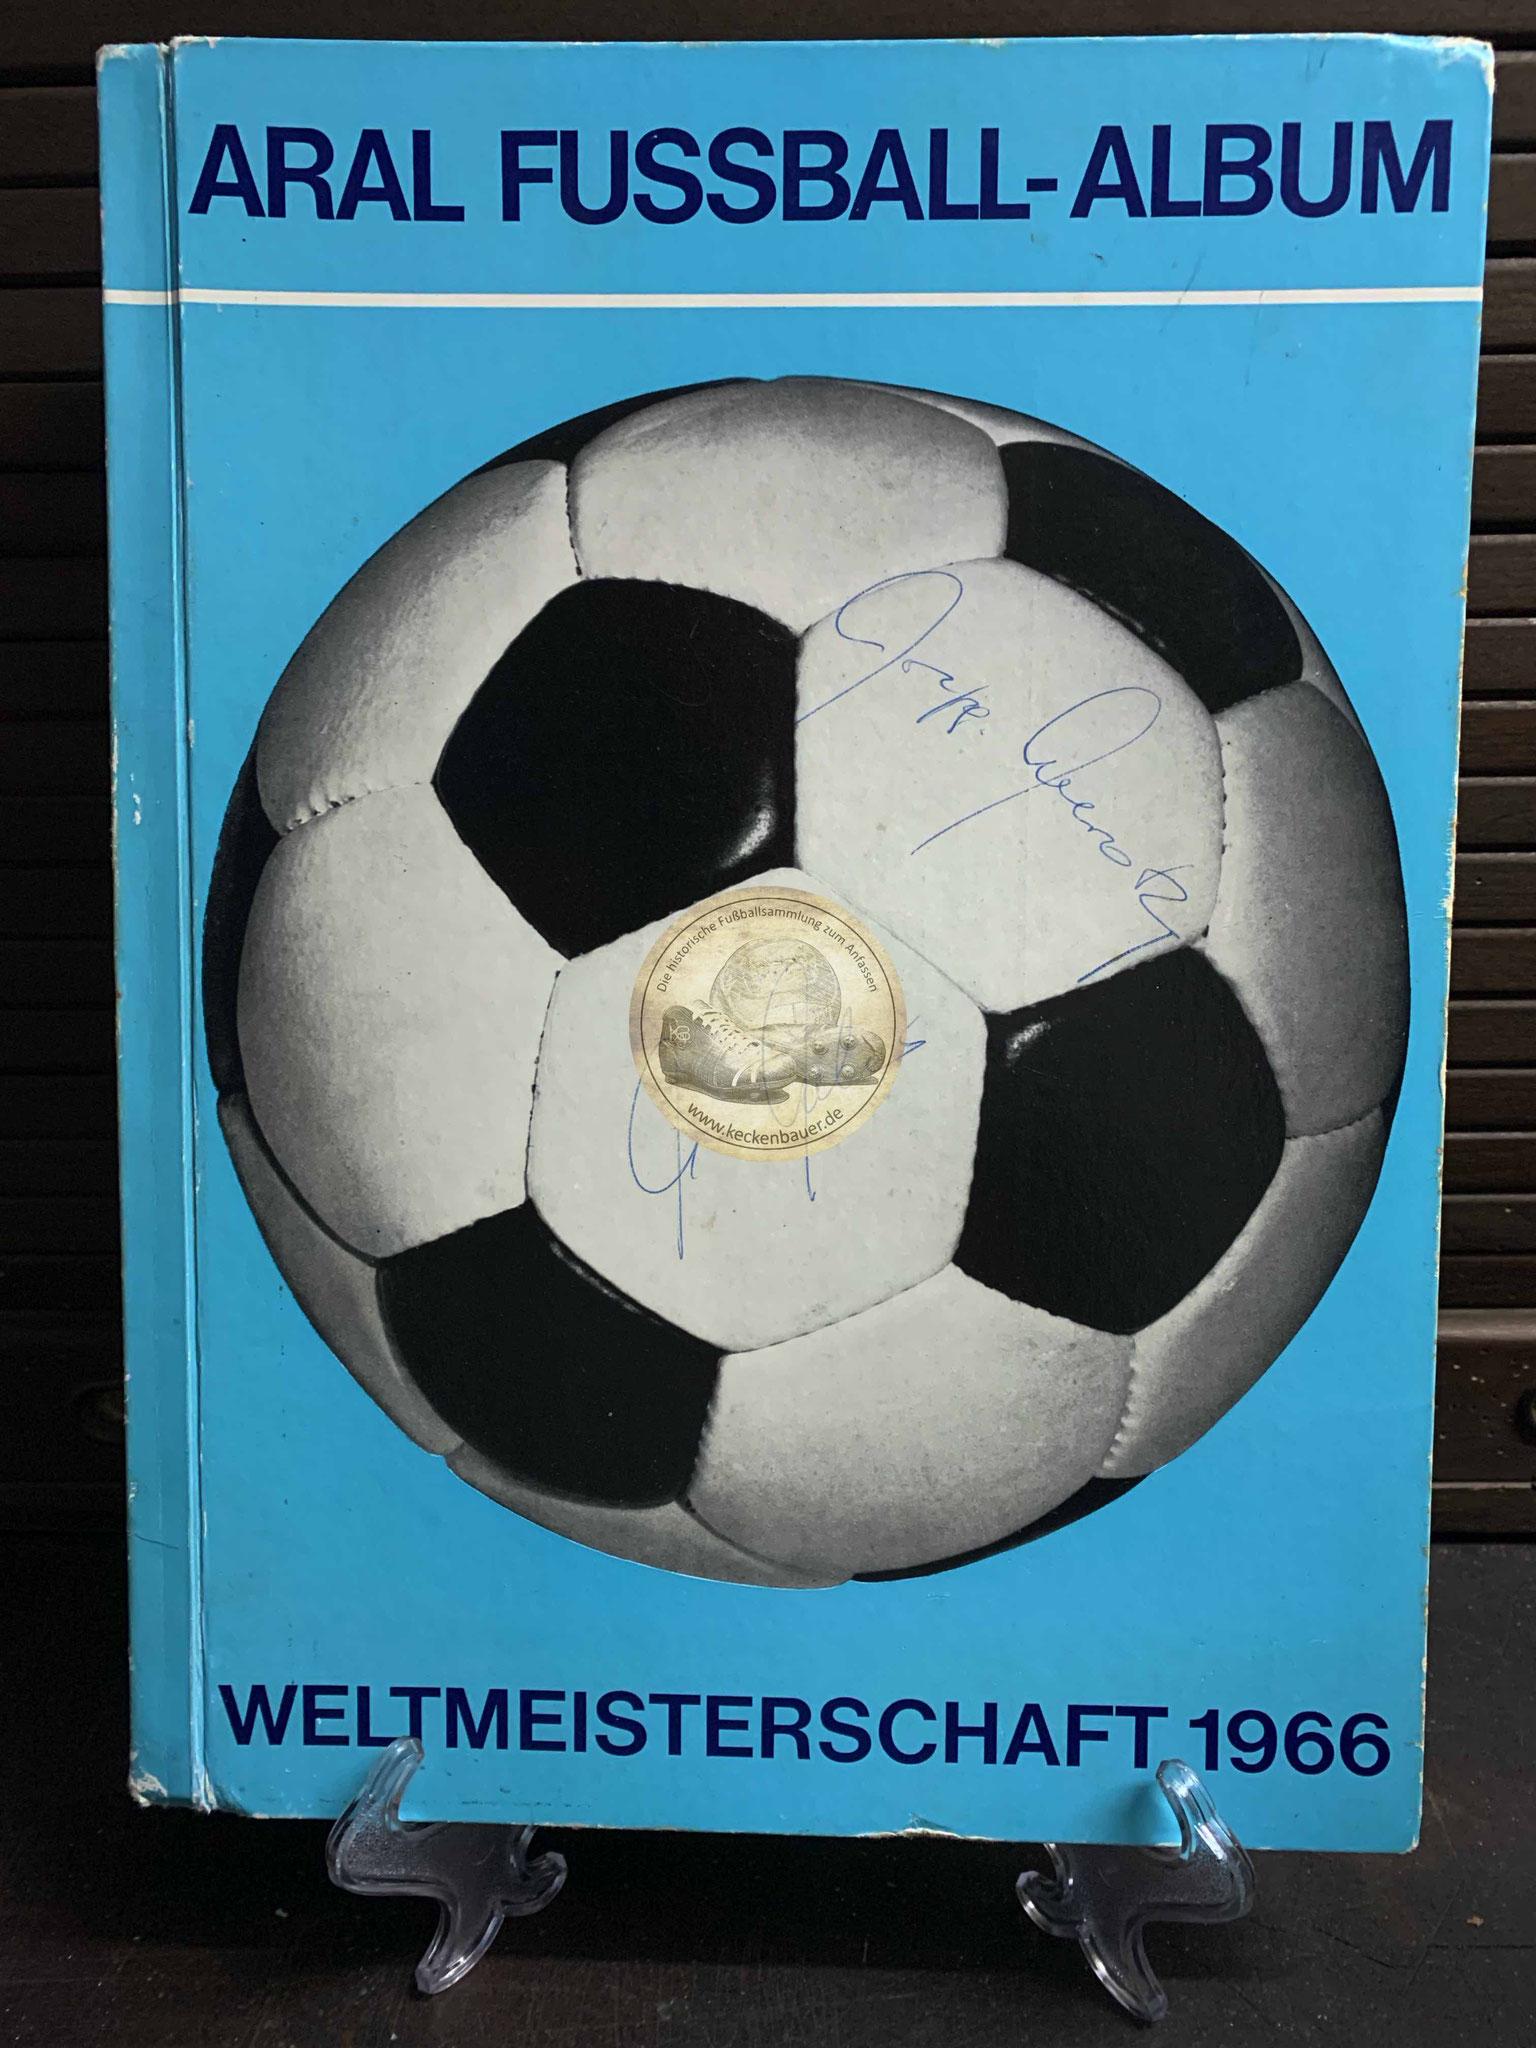 ARAL Fußball-Album Weltmeisterschaft 1966